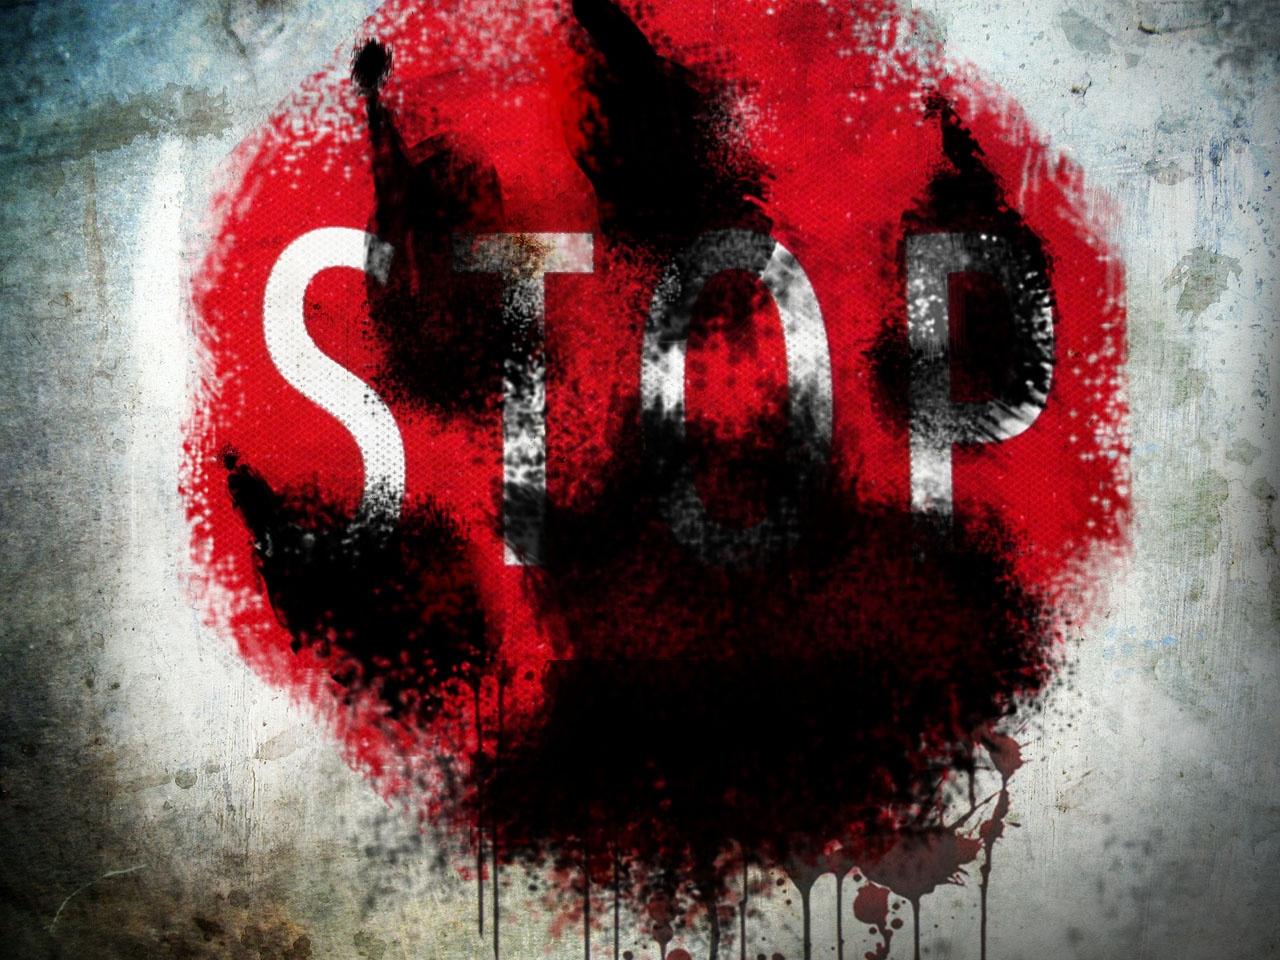 animal cruelty_stop_1555010661011.jpg.jpg